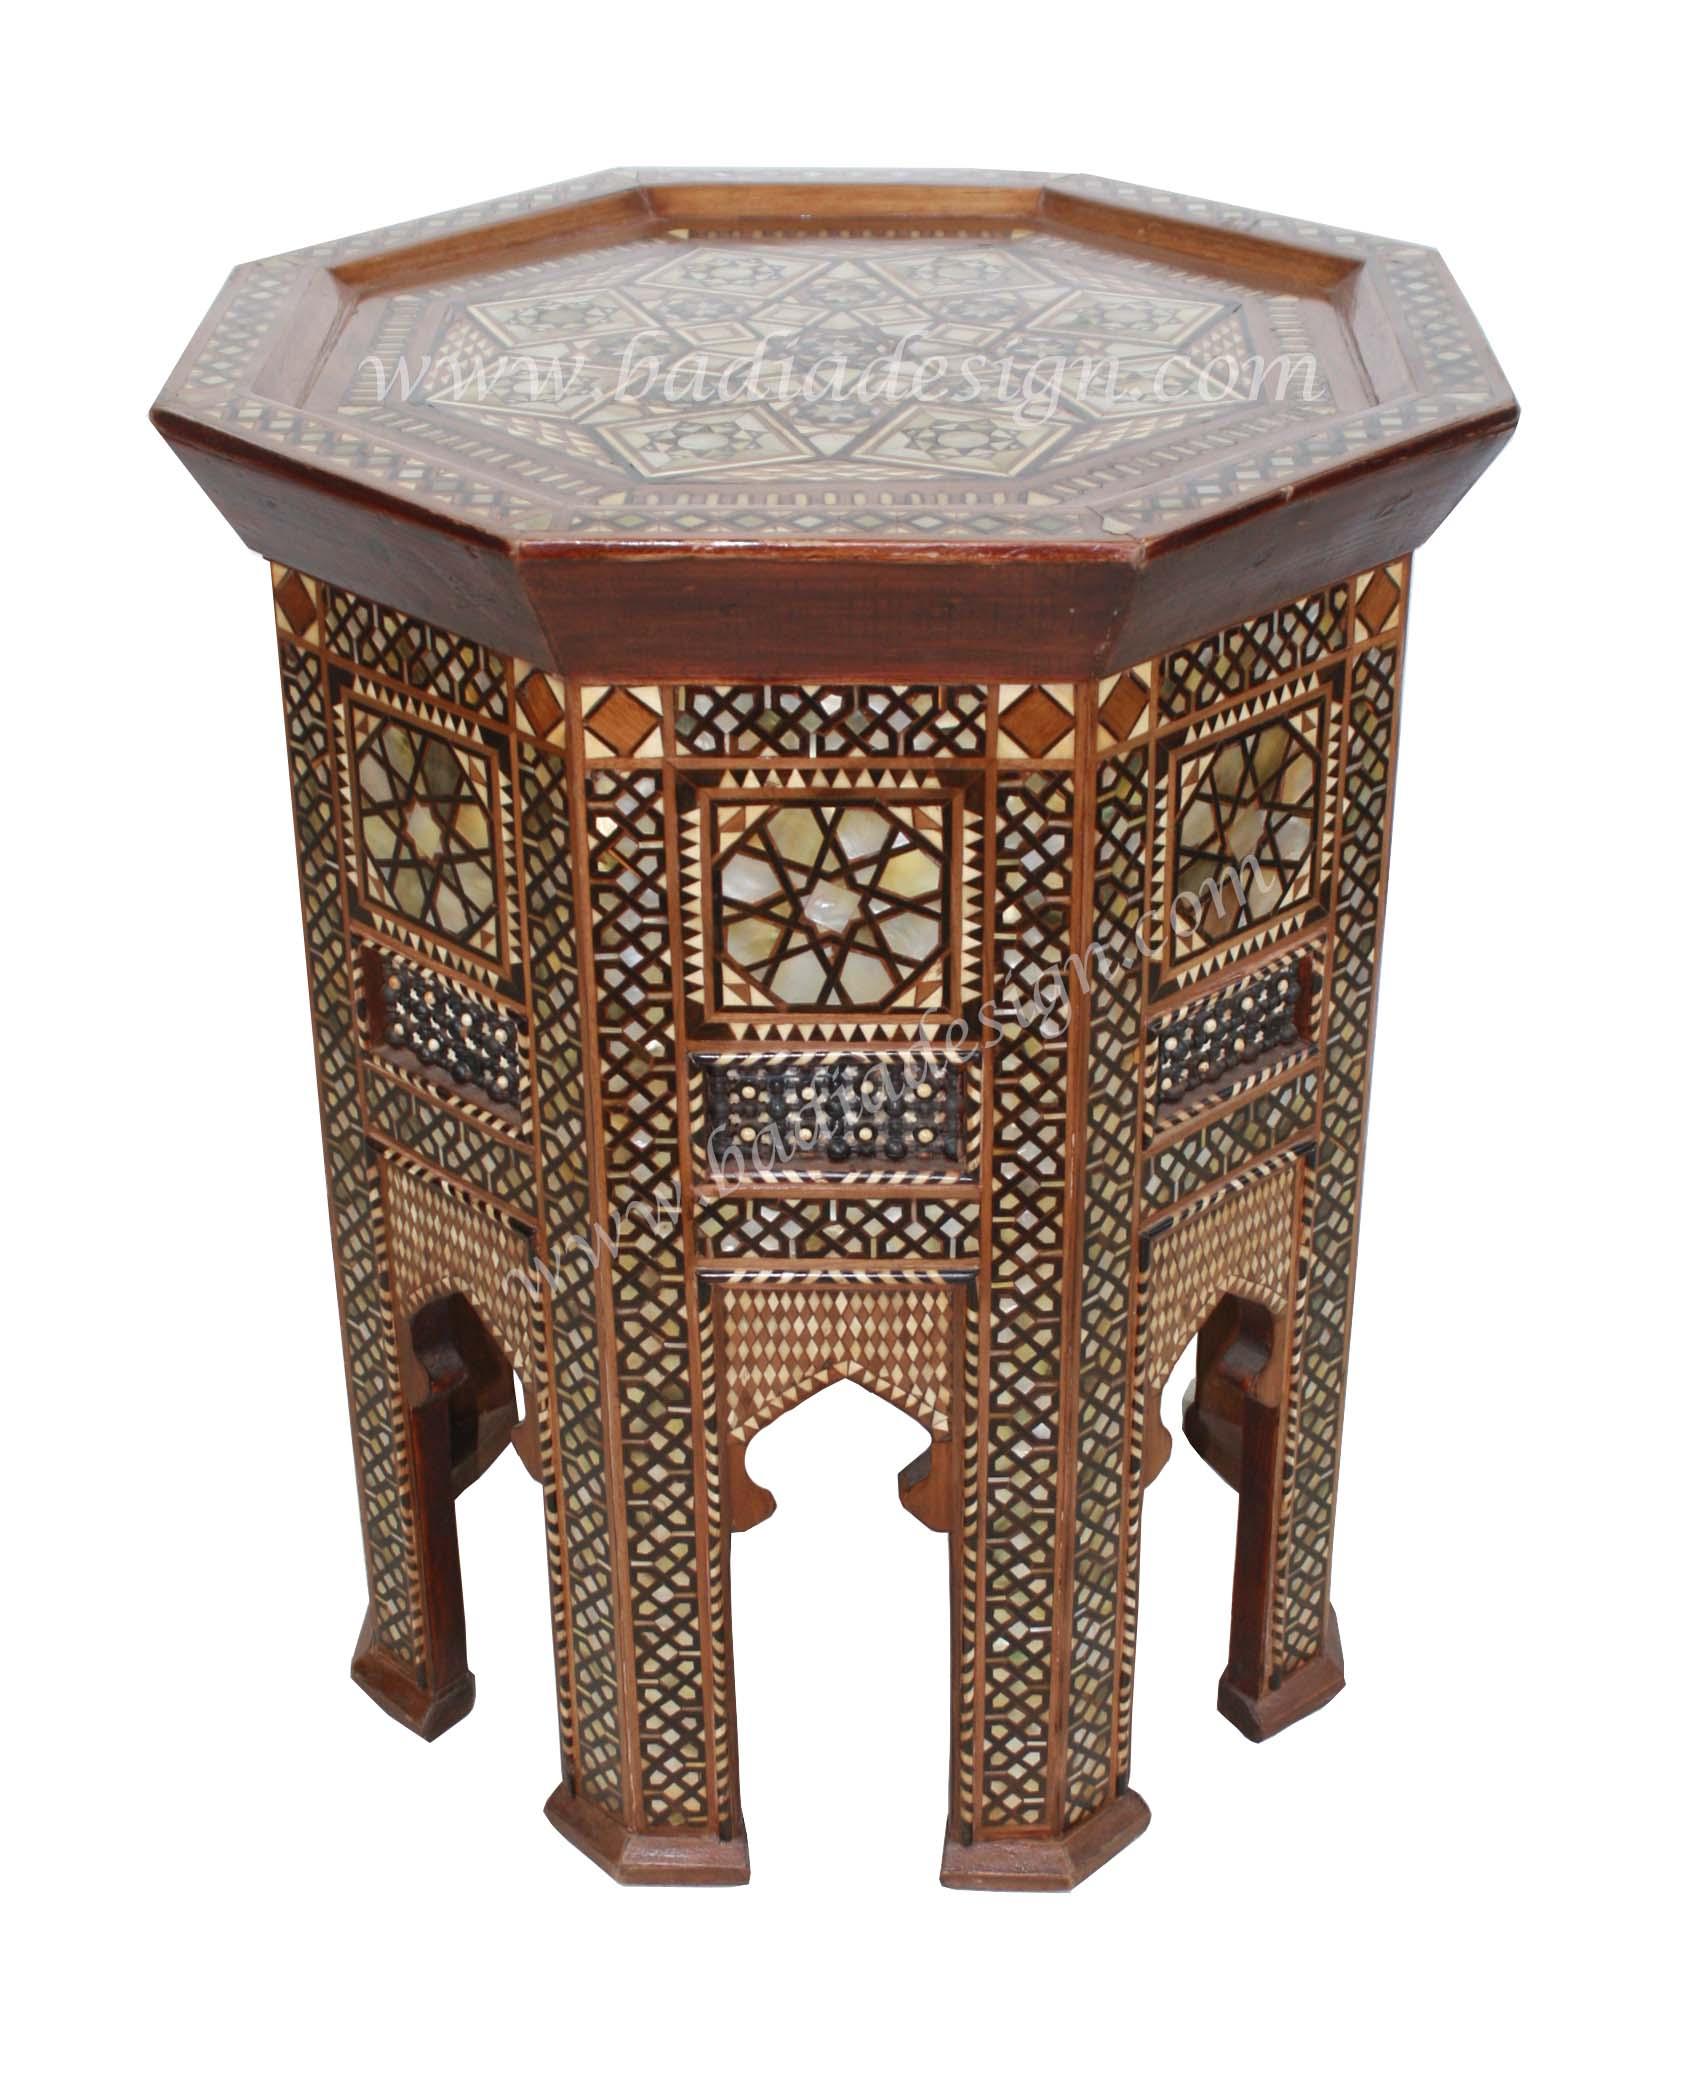 syrian-design-furniture-new-york-mop-st071-1.jpg